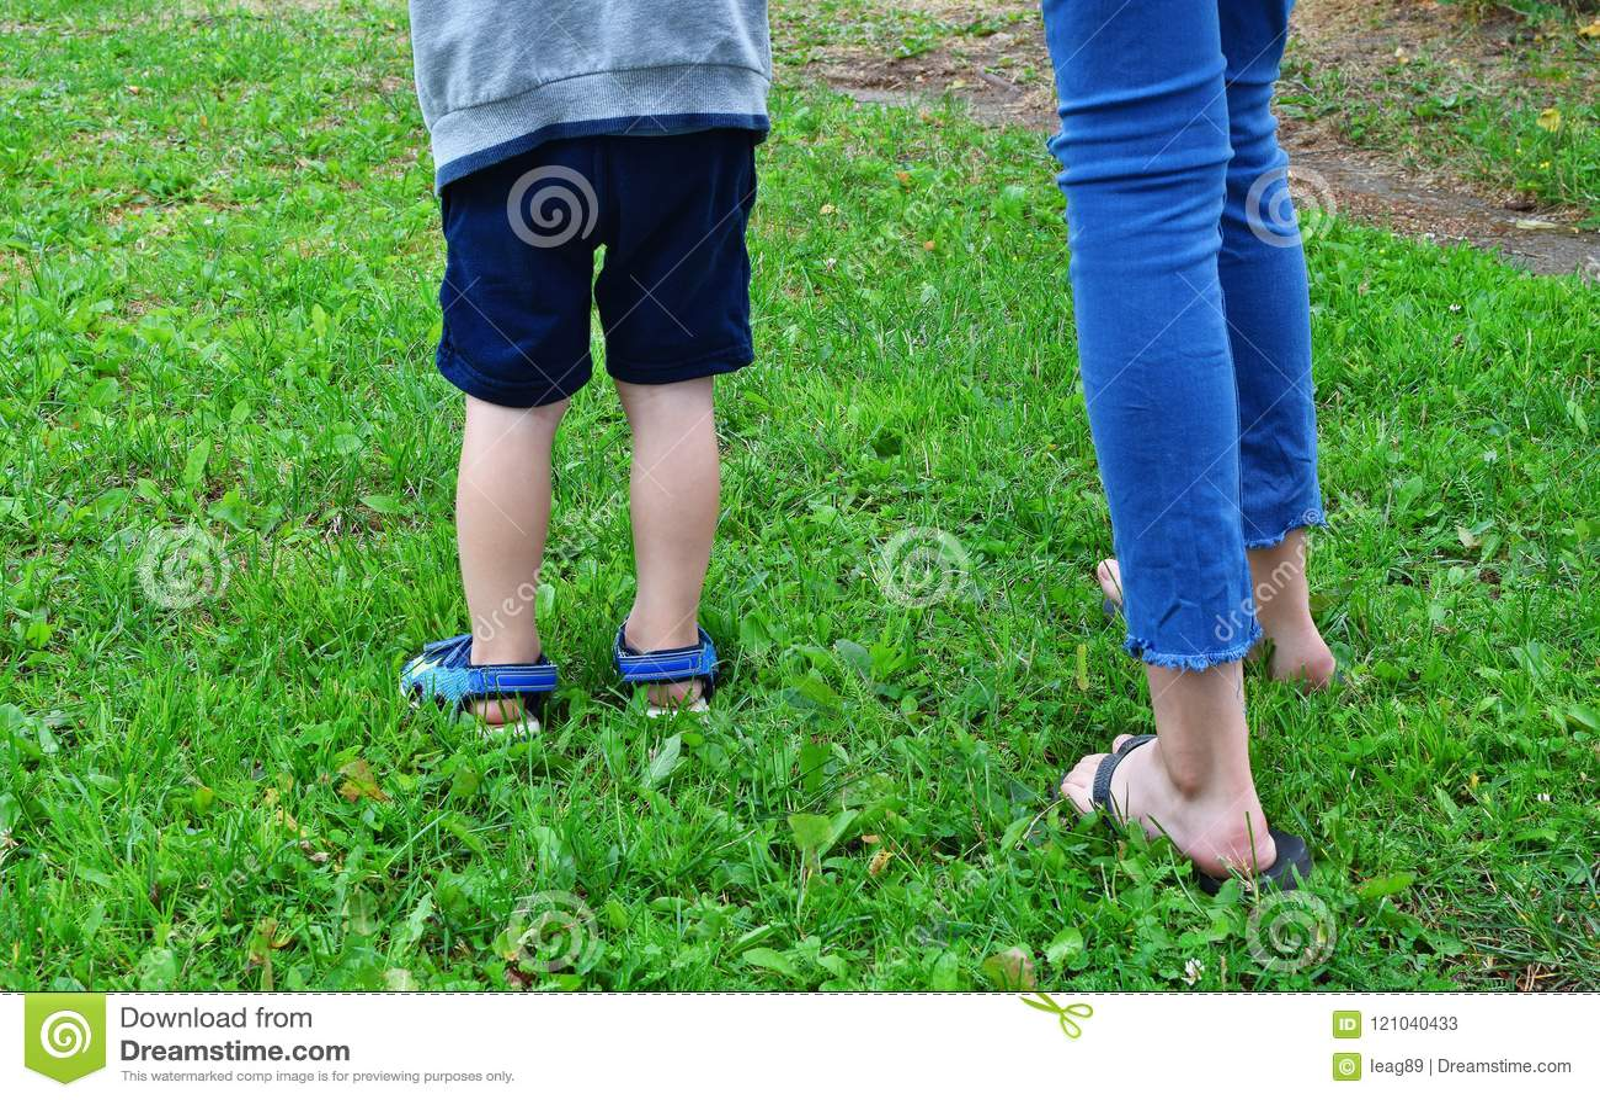 Jambes d enfants dehors dans l herbe